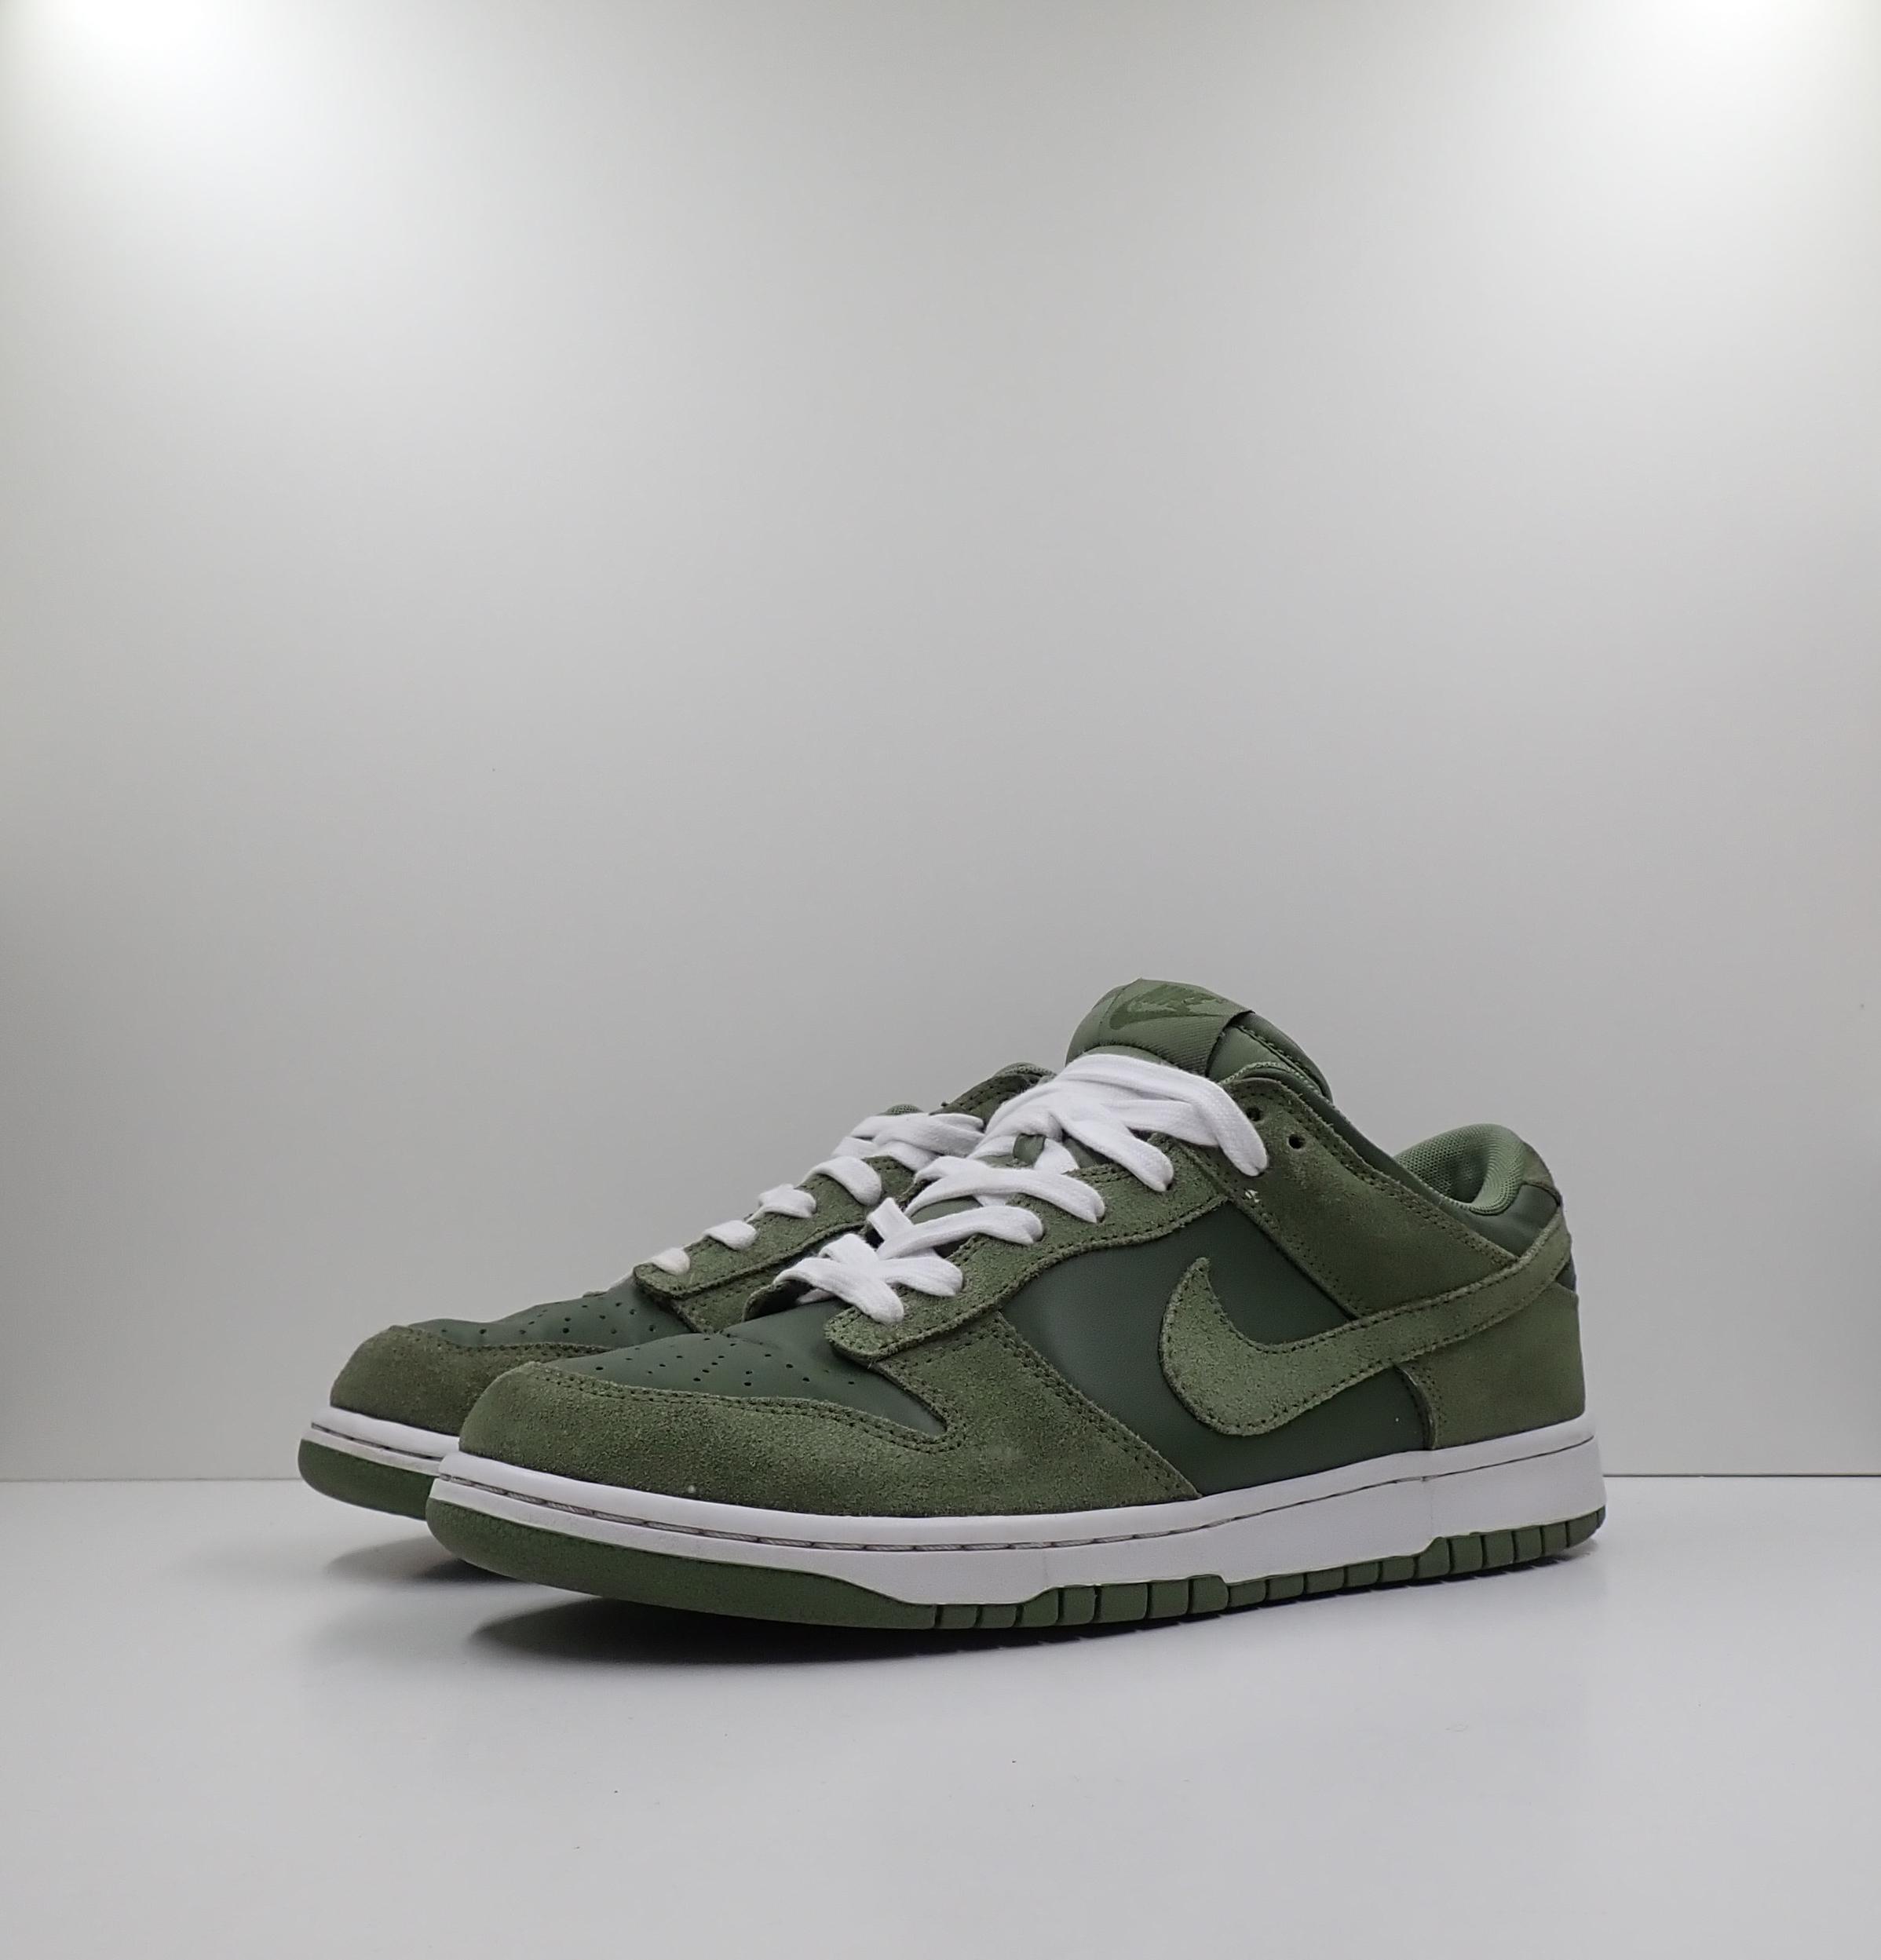 Nike Dunk Low Palm Green